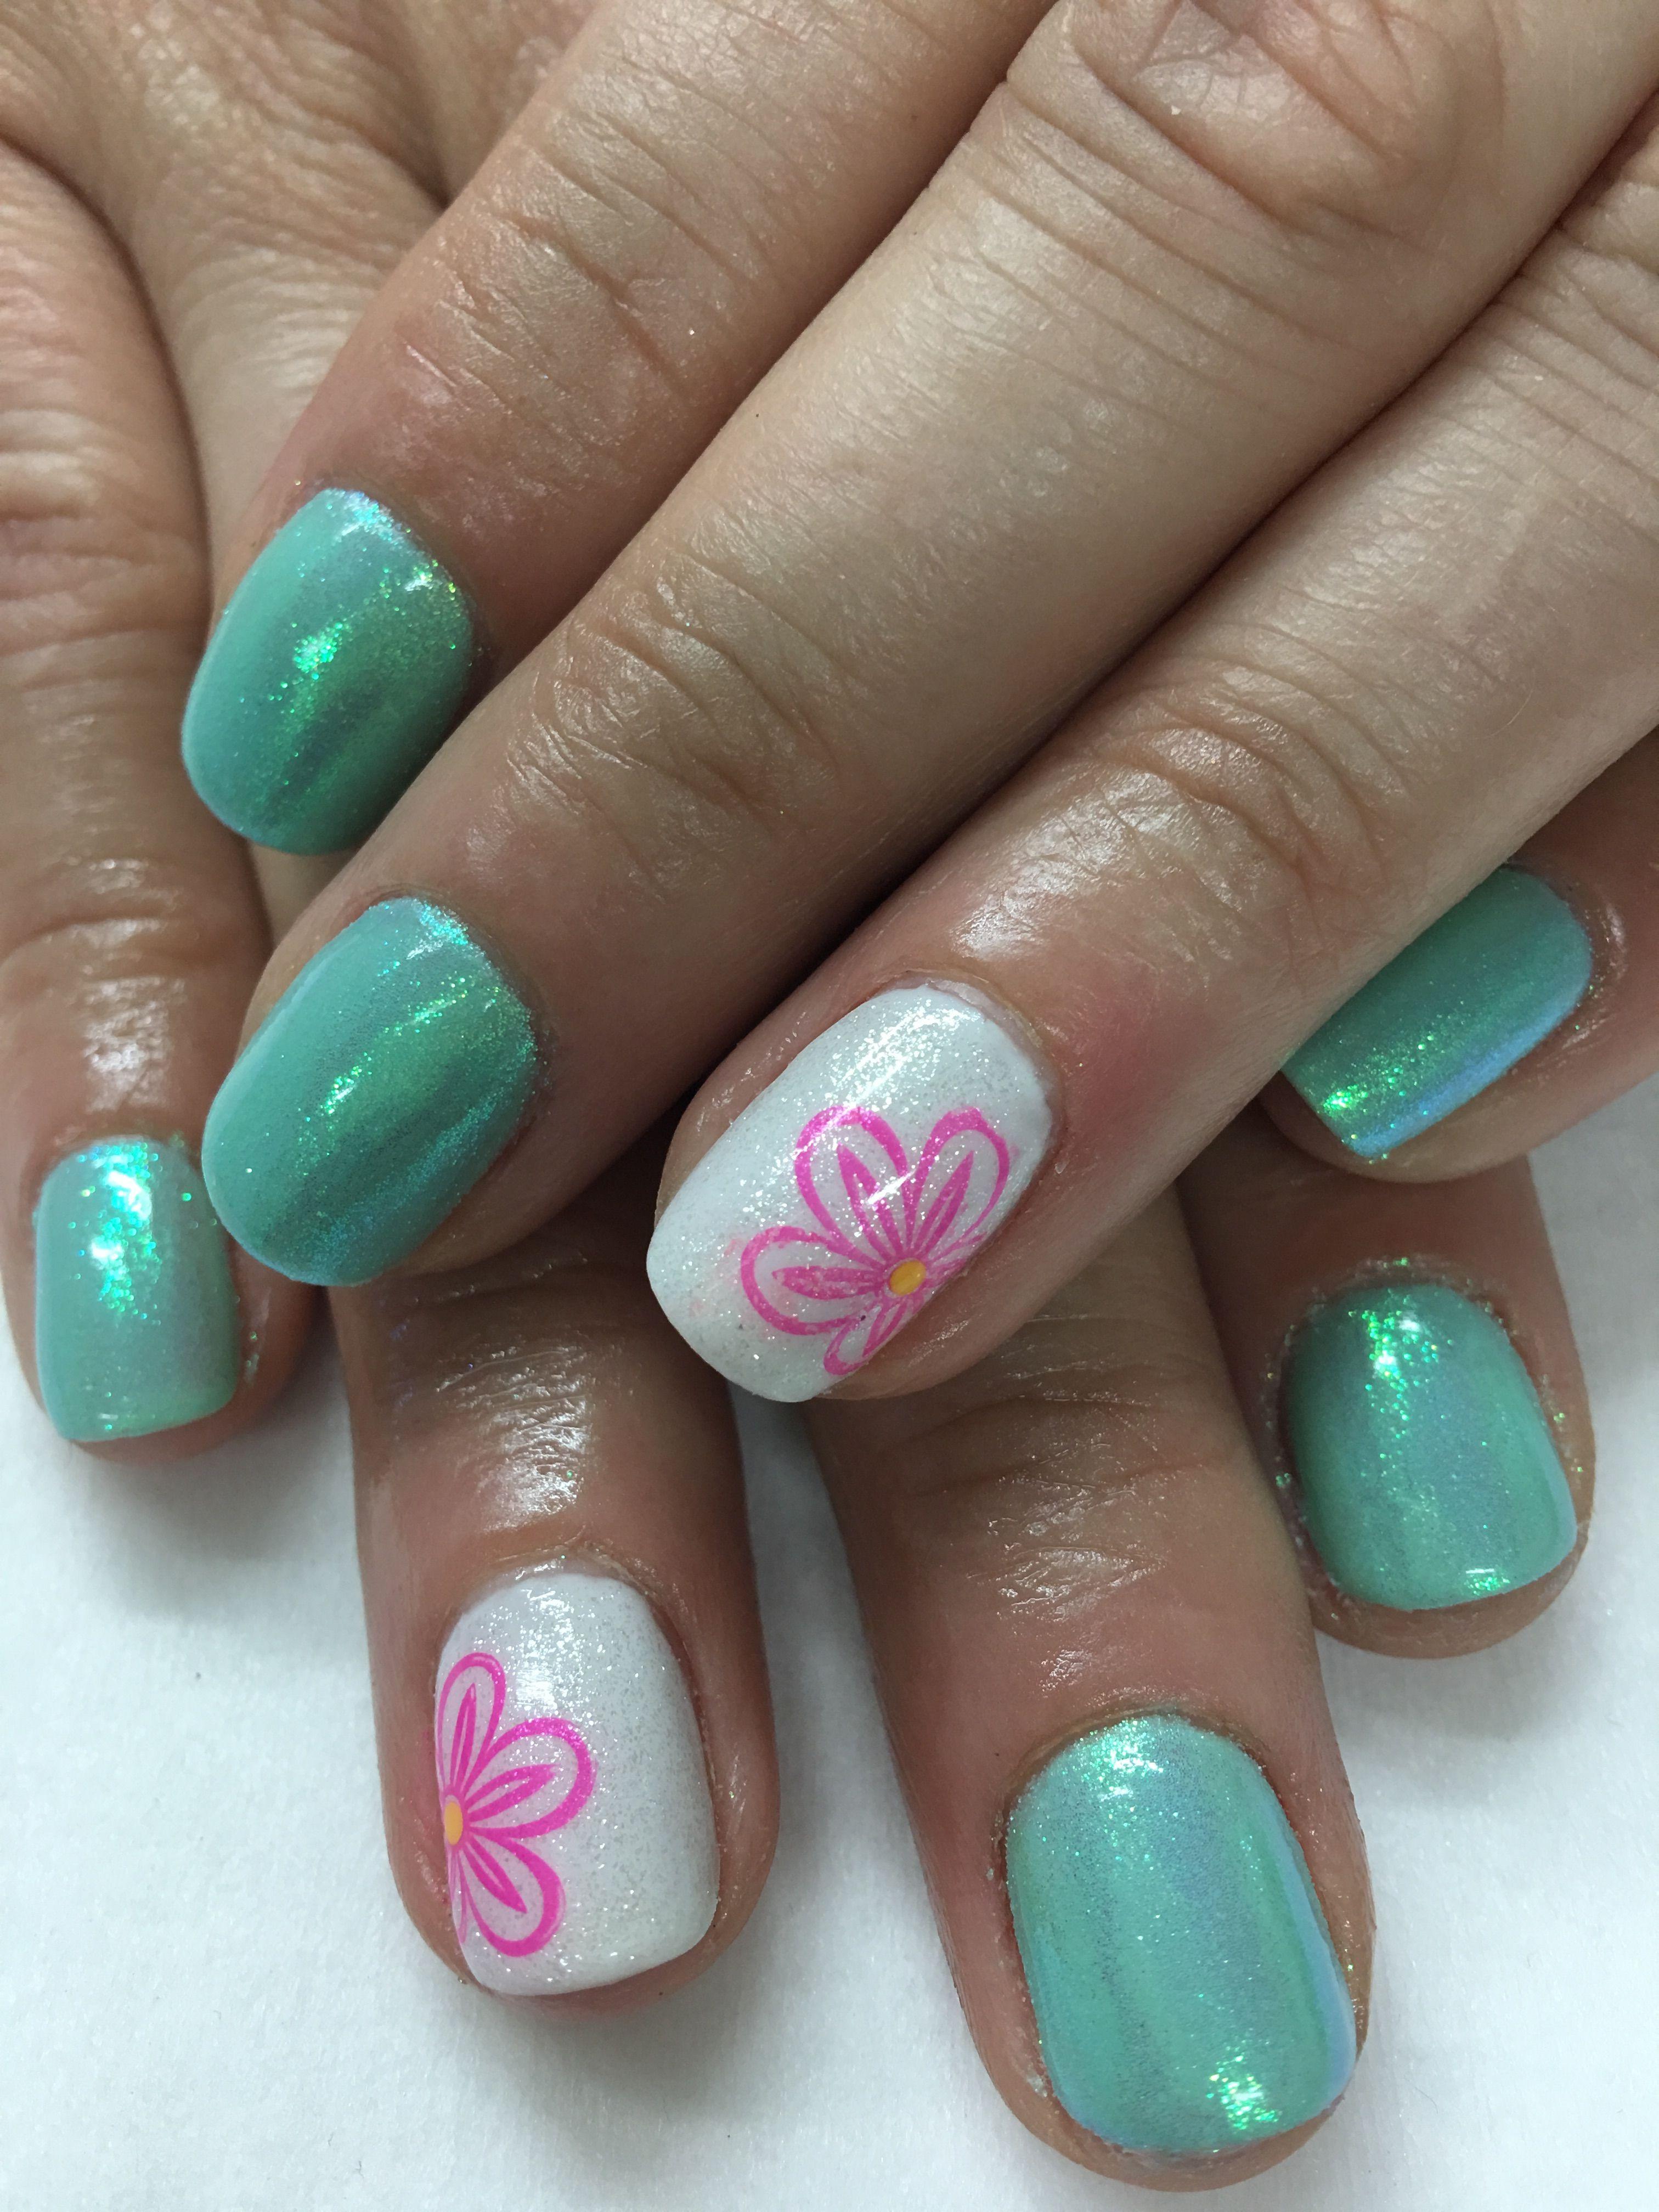 Spring Mint Indigo Emerald Mermaid Shimmer Unicorn Shimmer